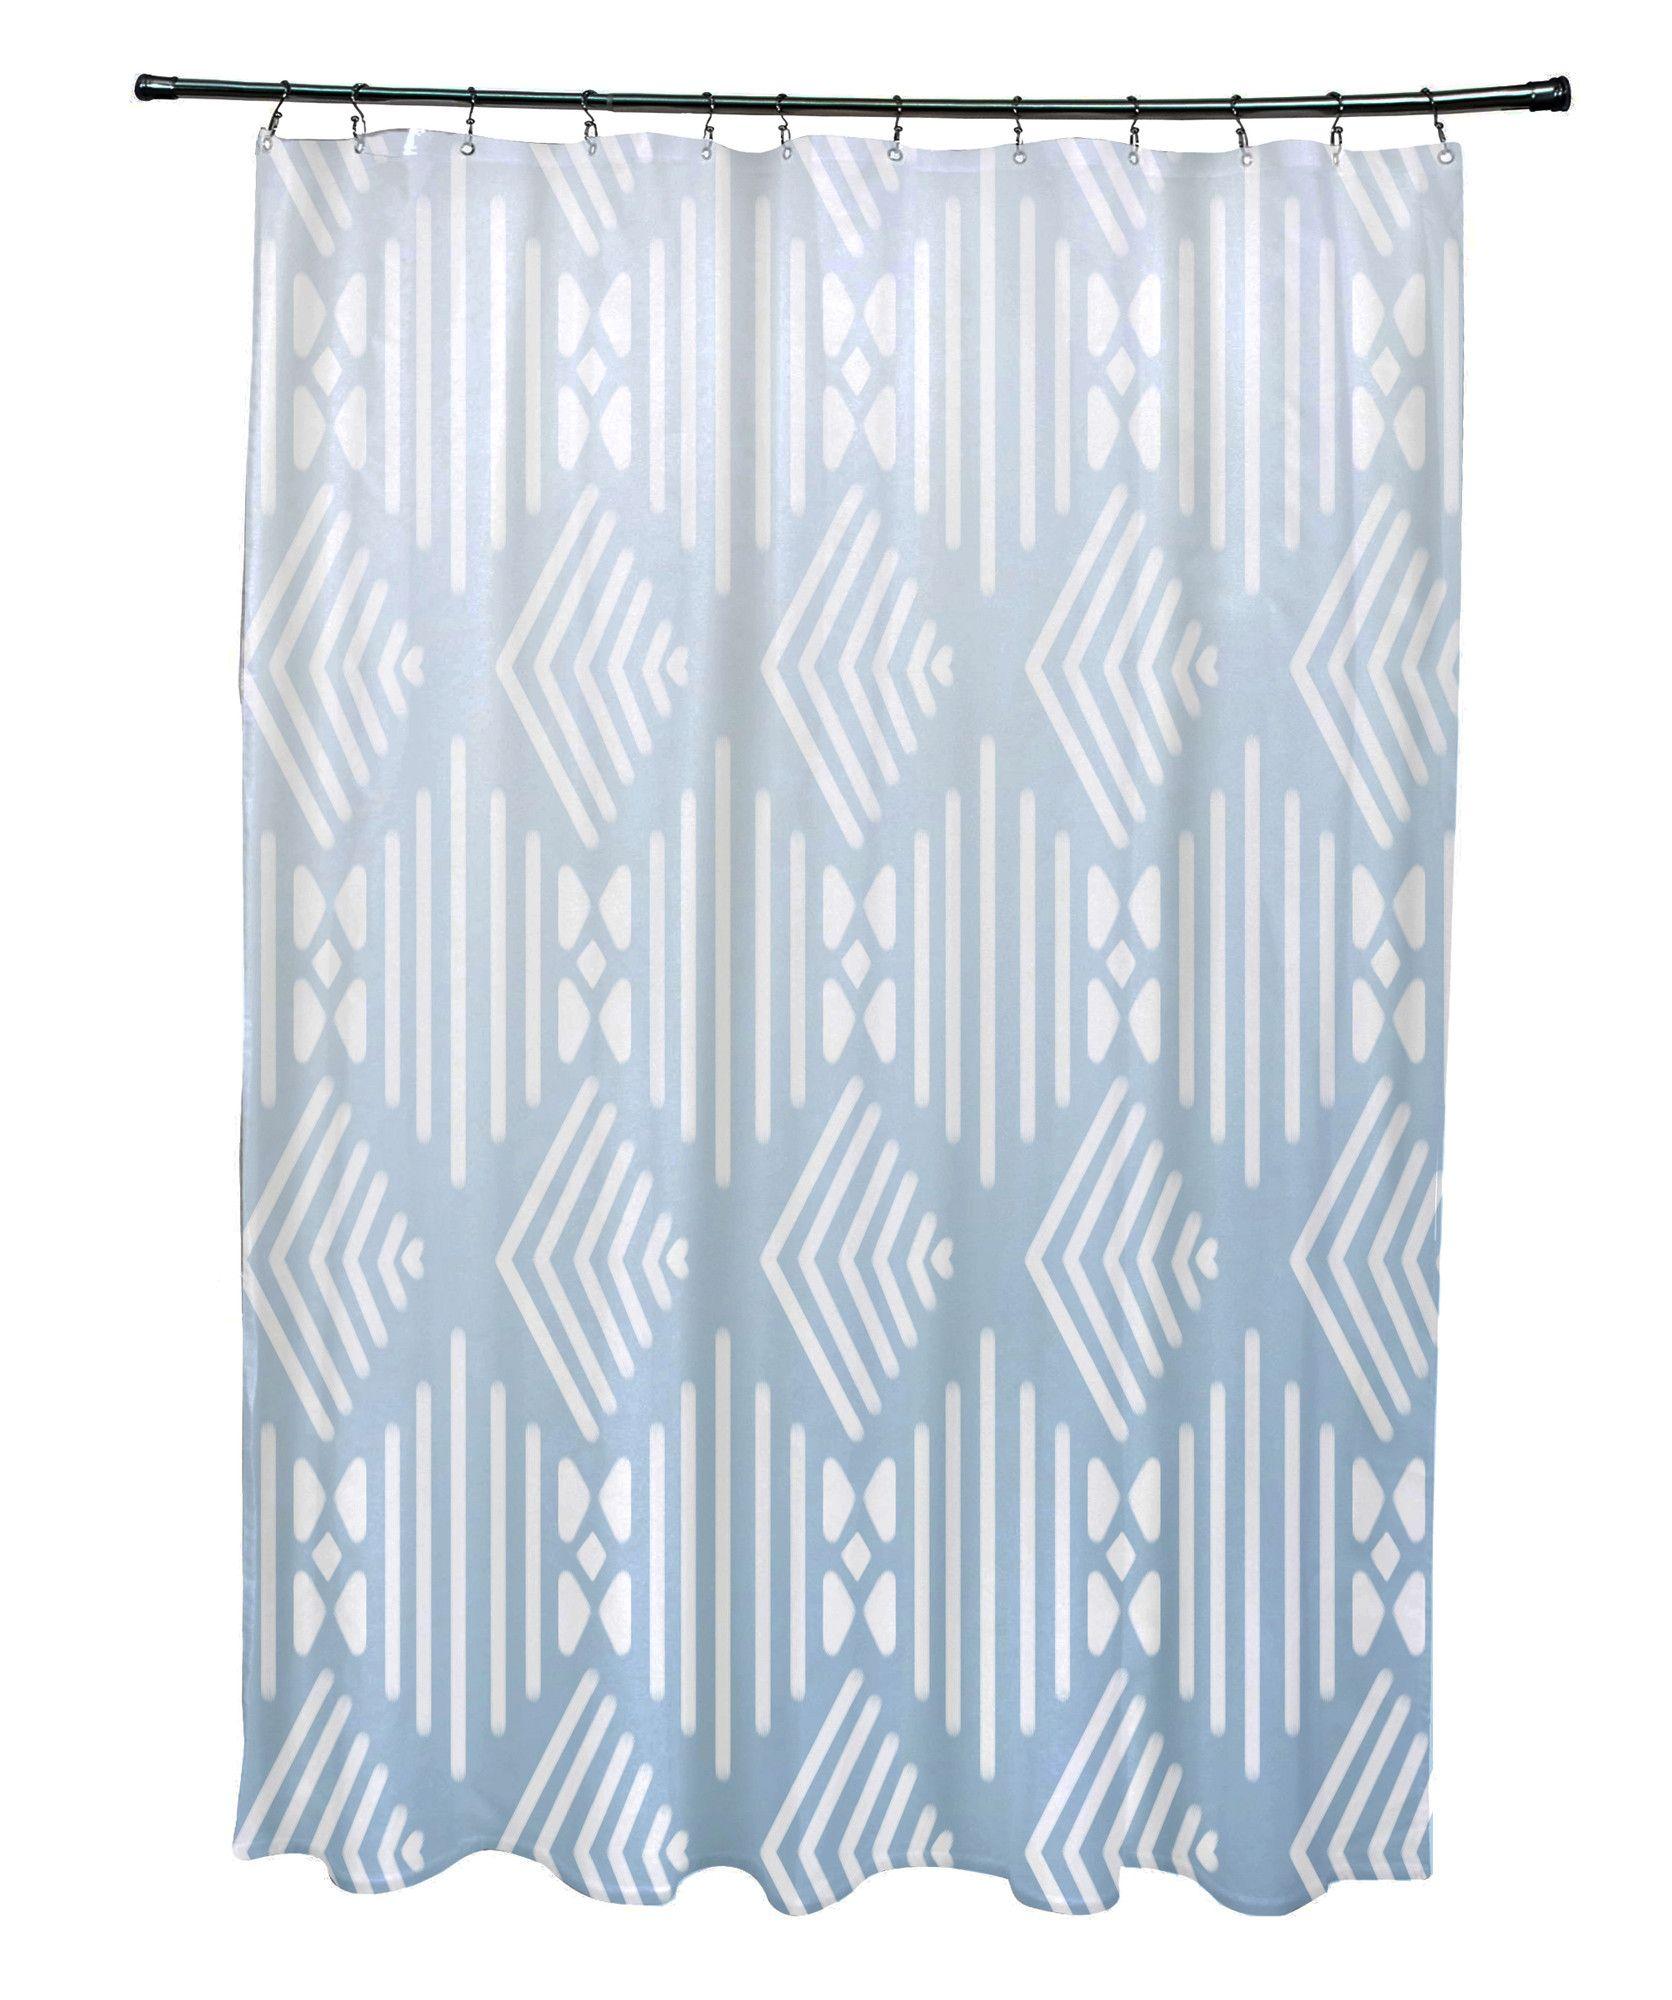 Fishbones Geometric Print Shower Curtain Blue Shower Curtains